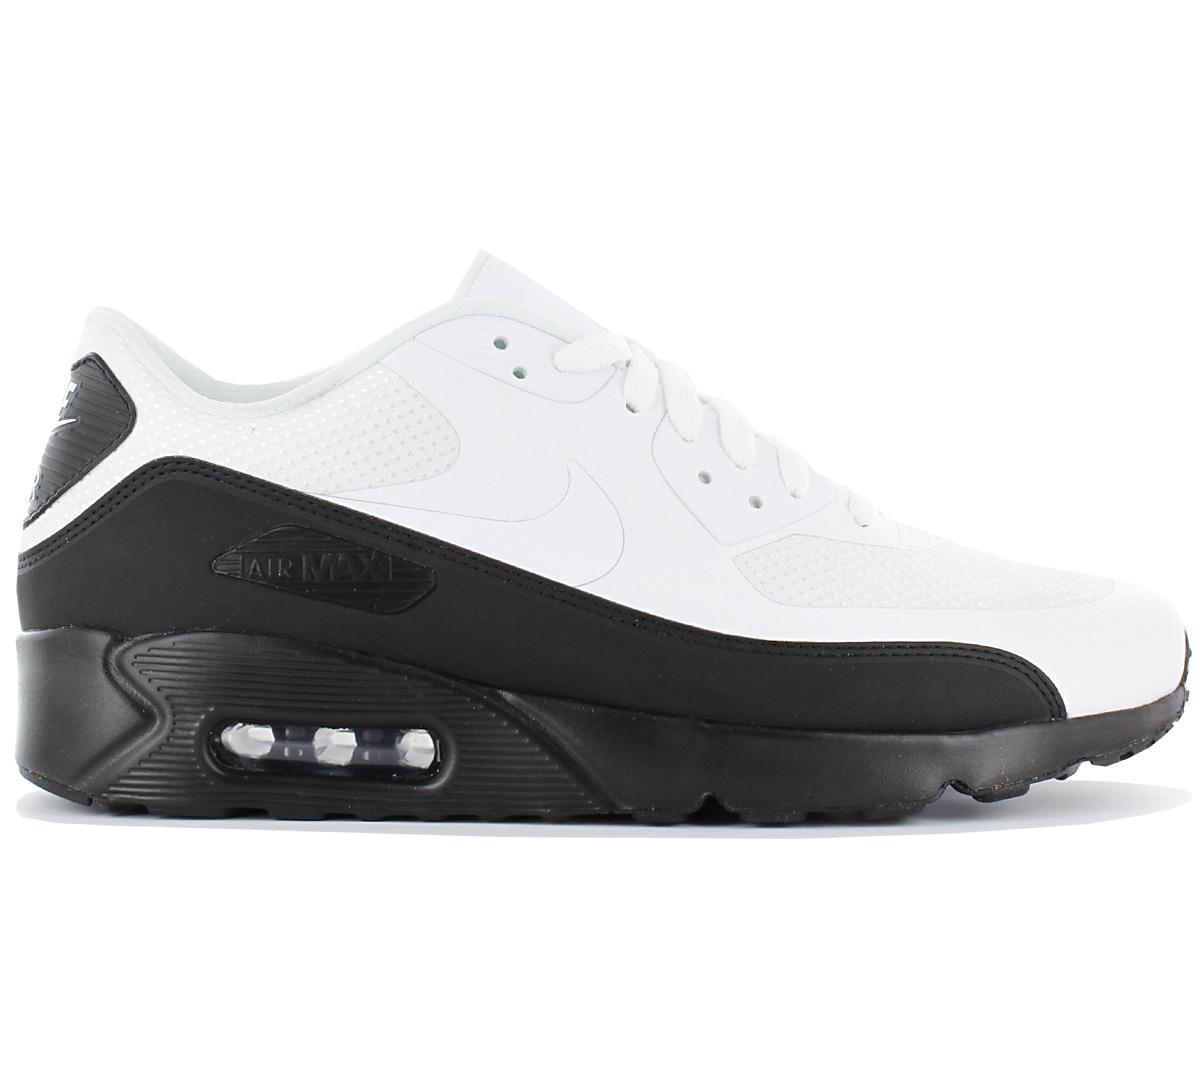 a7e9e0c9d6c8b 18 Nike Air Max 90 Ultra 2.0 Essential 875695-015  EU 45.5 US 11.5